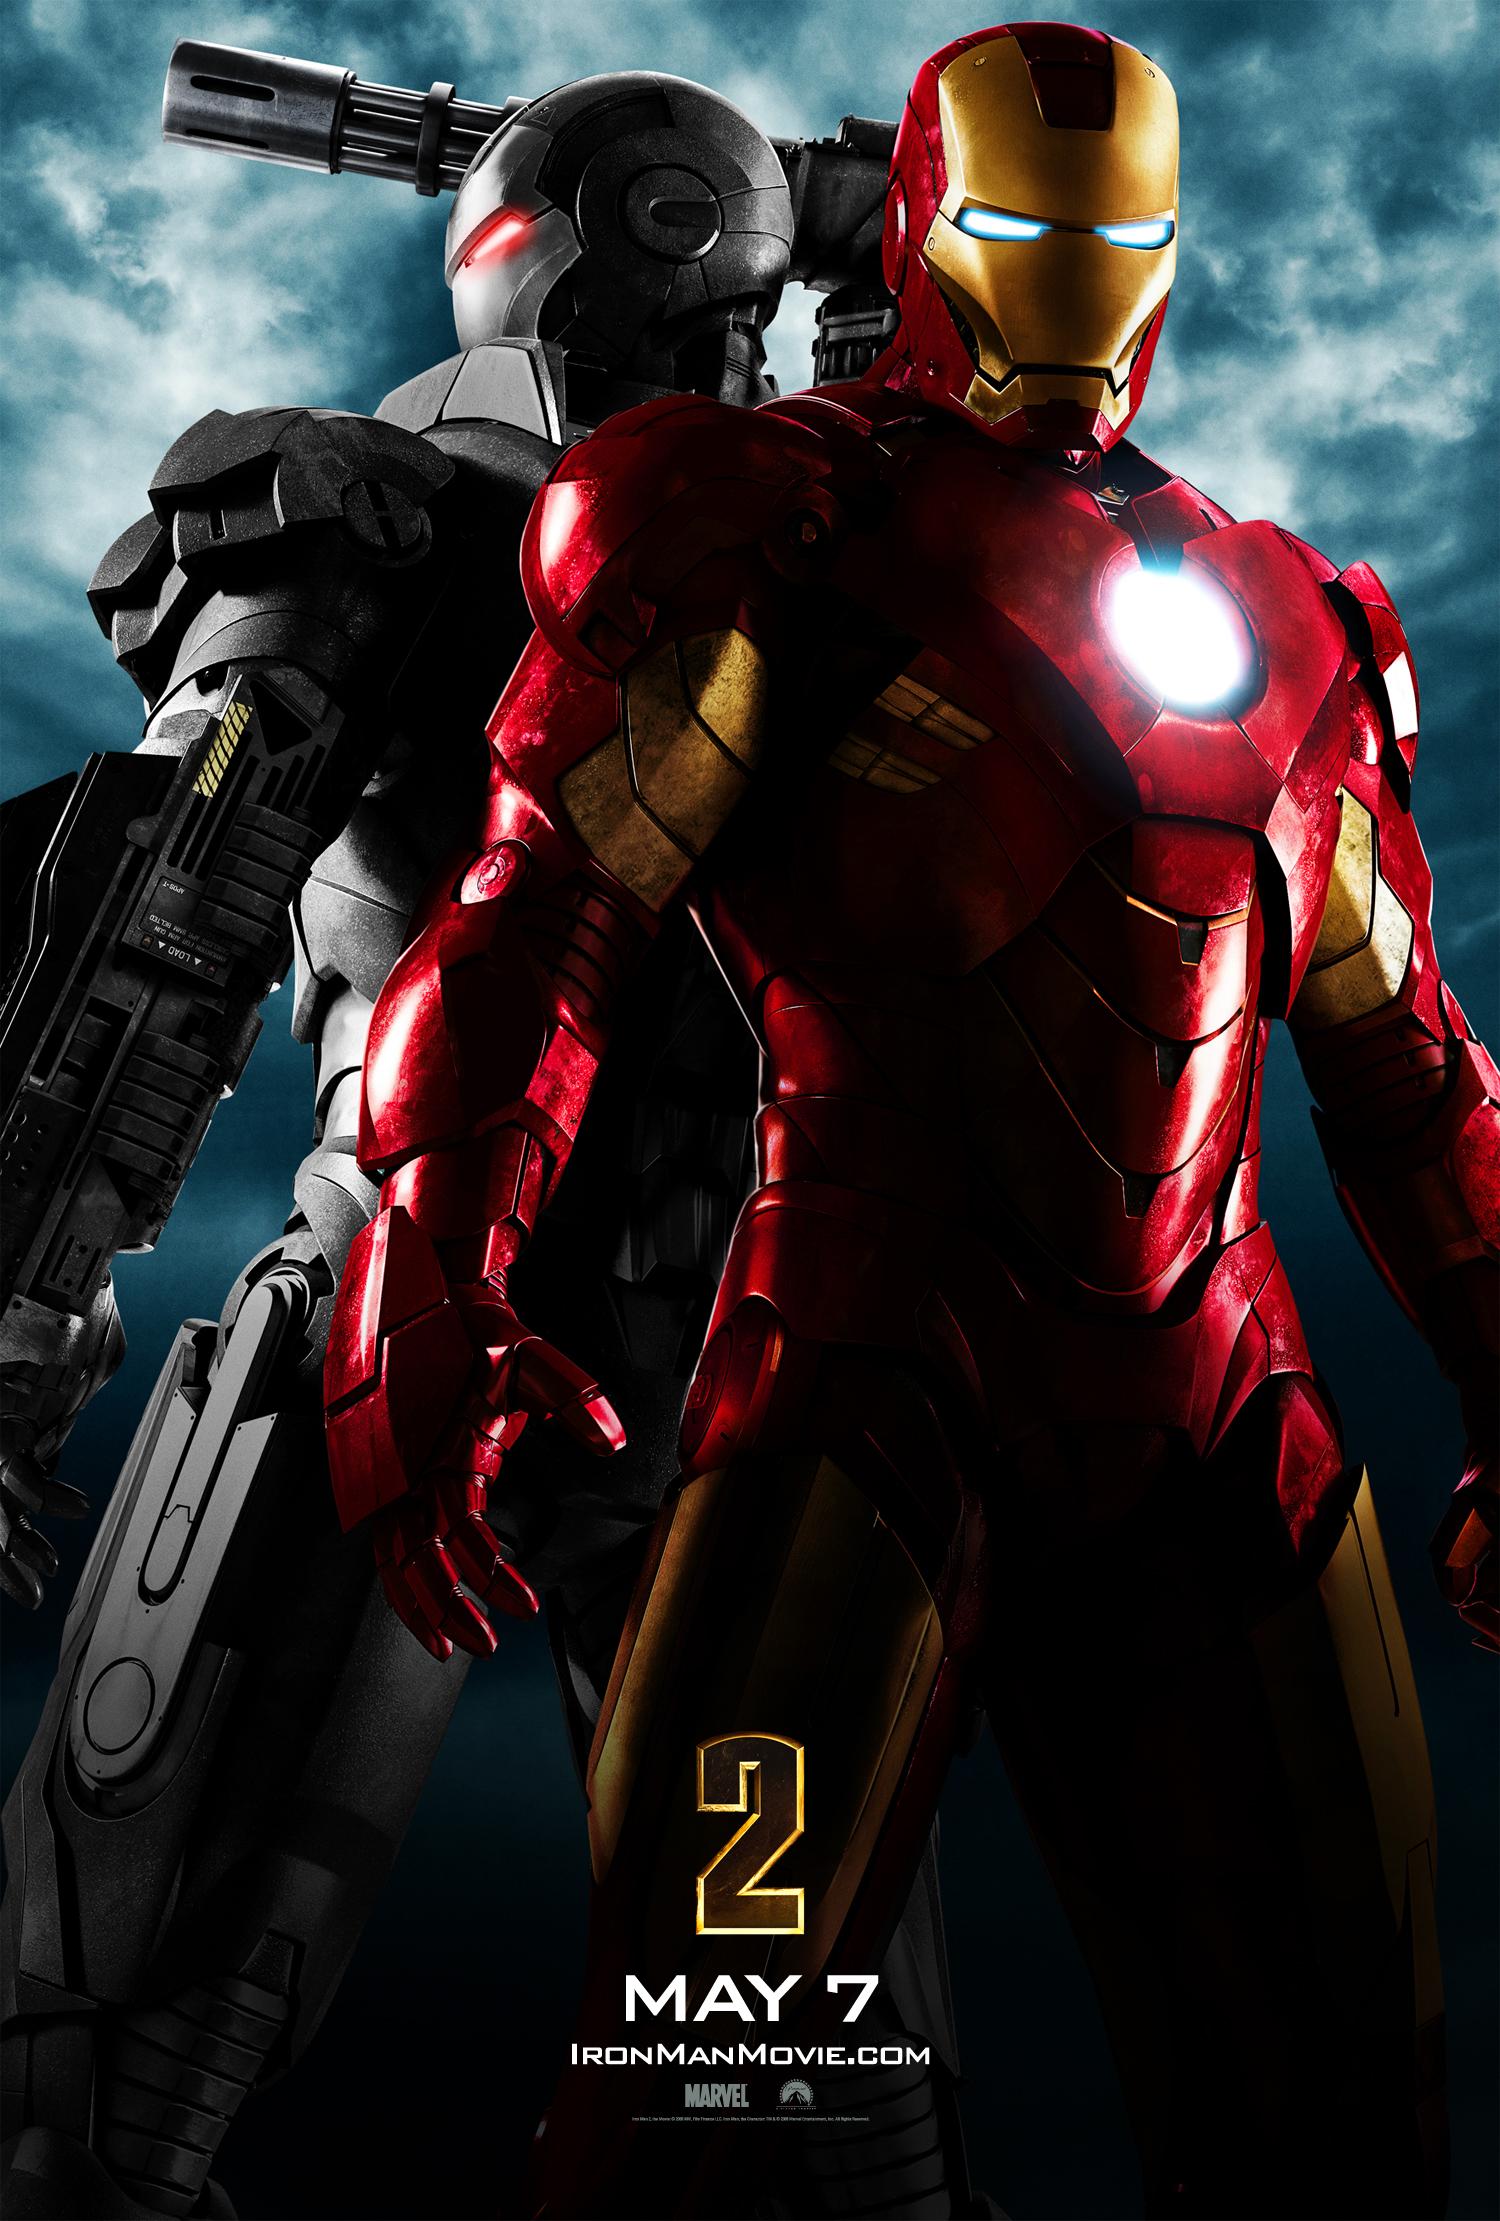 HQ Iron Man 2 Wallpapers | File 2280.63Kb